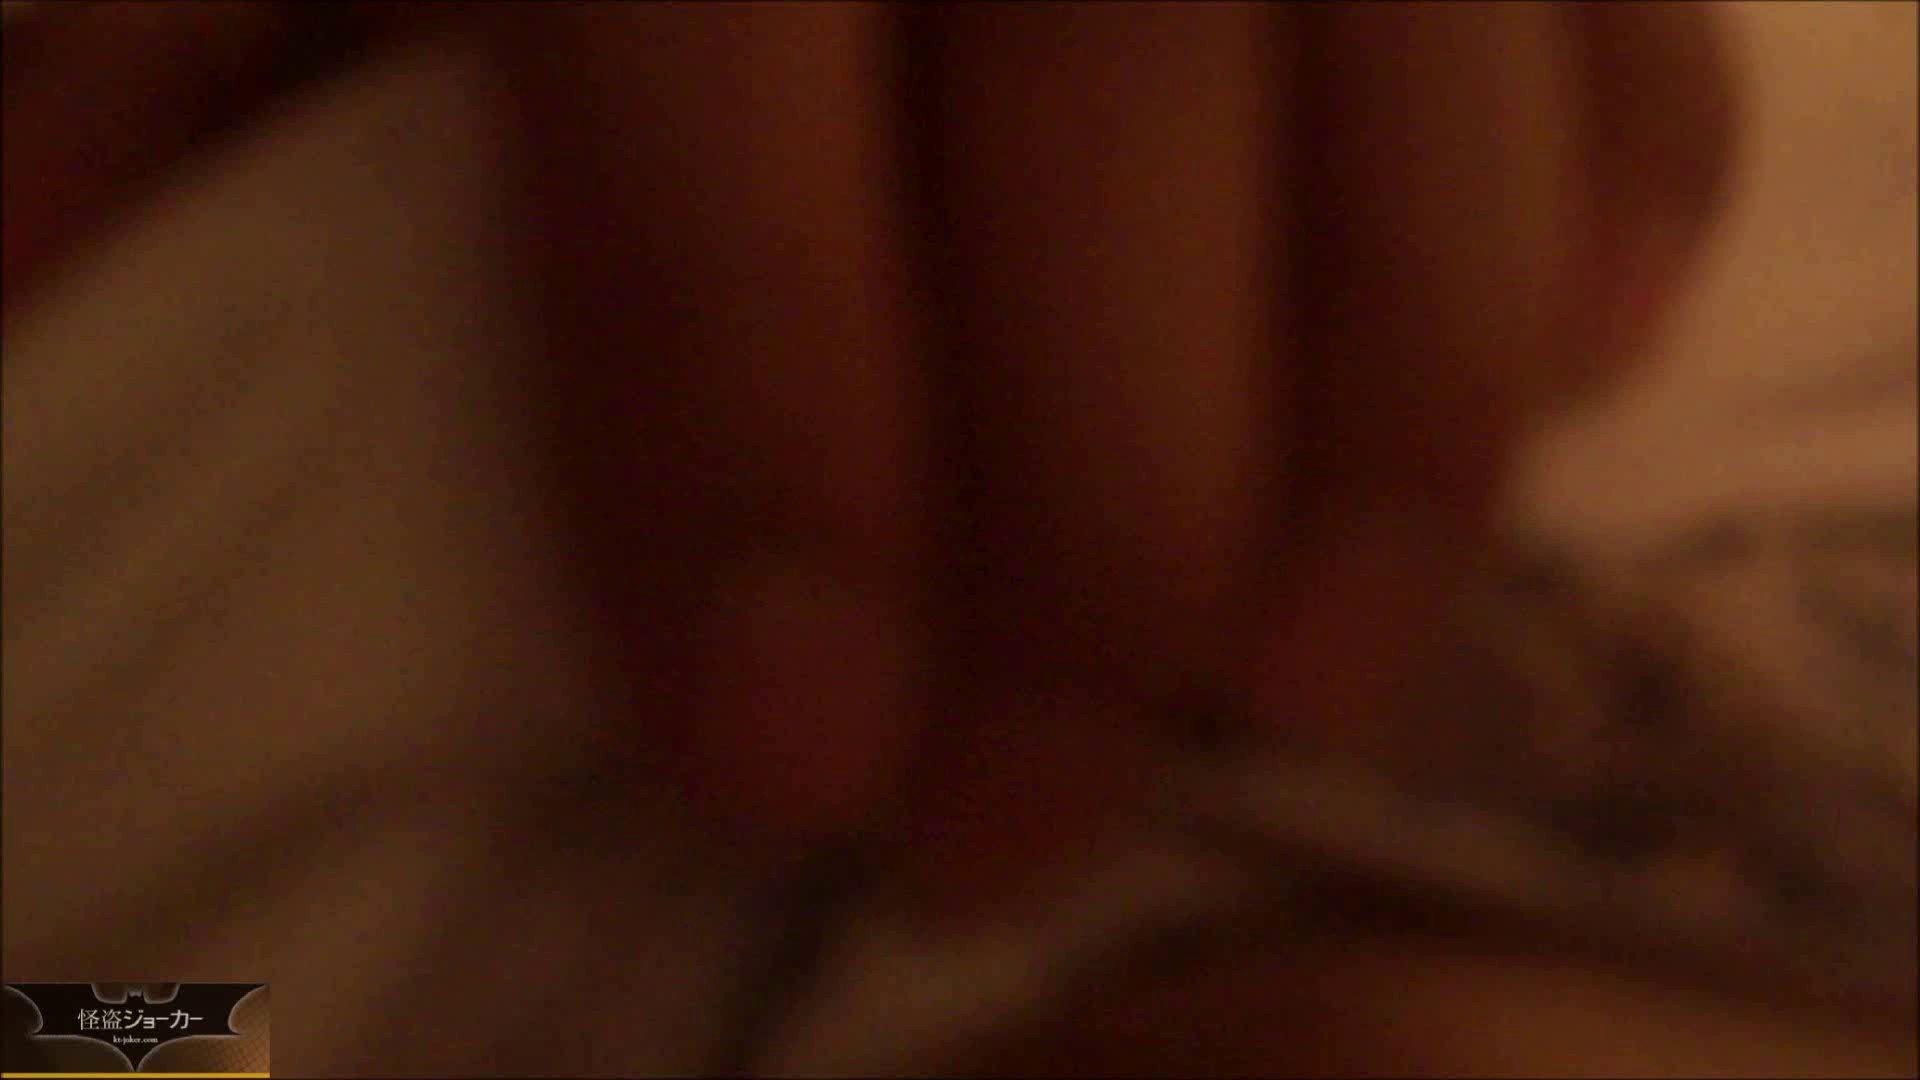 vol.4【白衣の天使23歳】☆のりこちゃん☆ホテルお持ち帰り。朦朧のまま感じて 美肌 | 丸見え  109画像 79